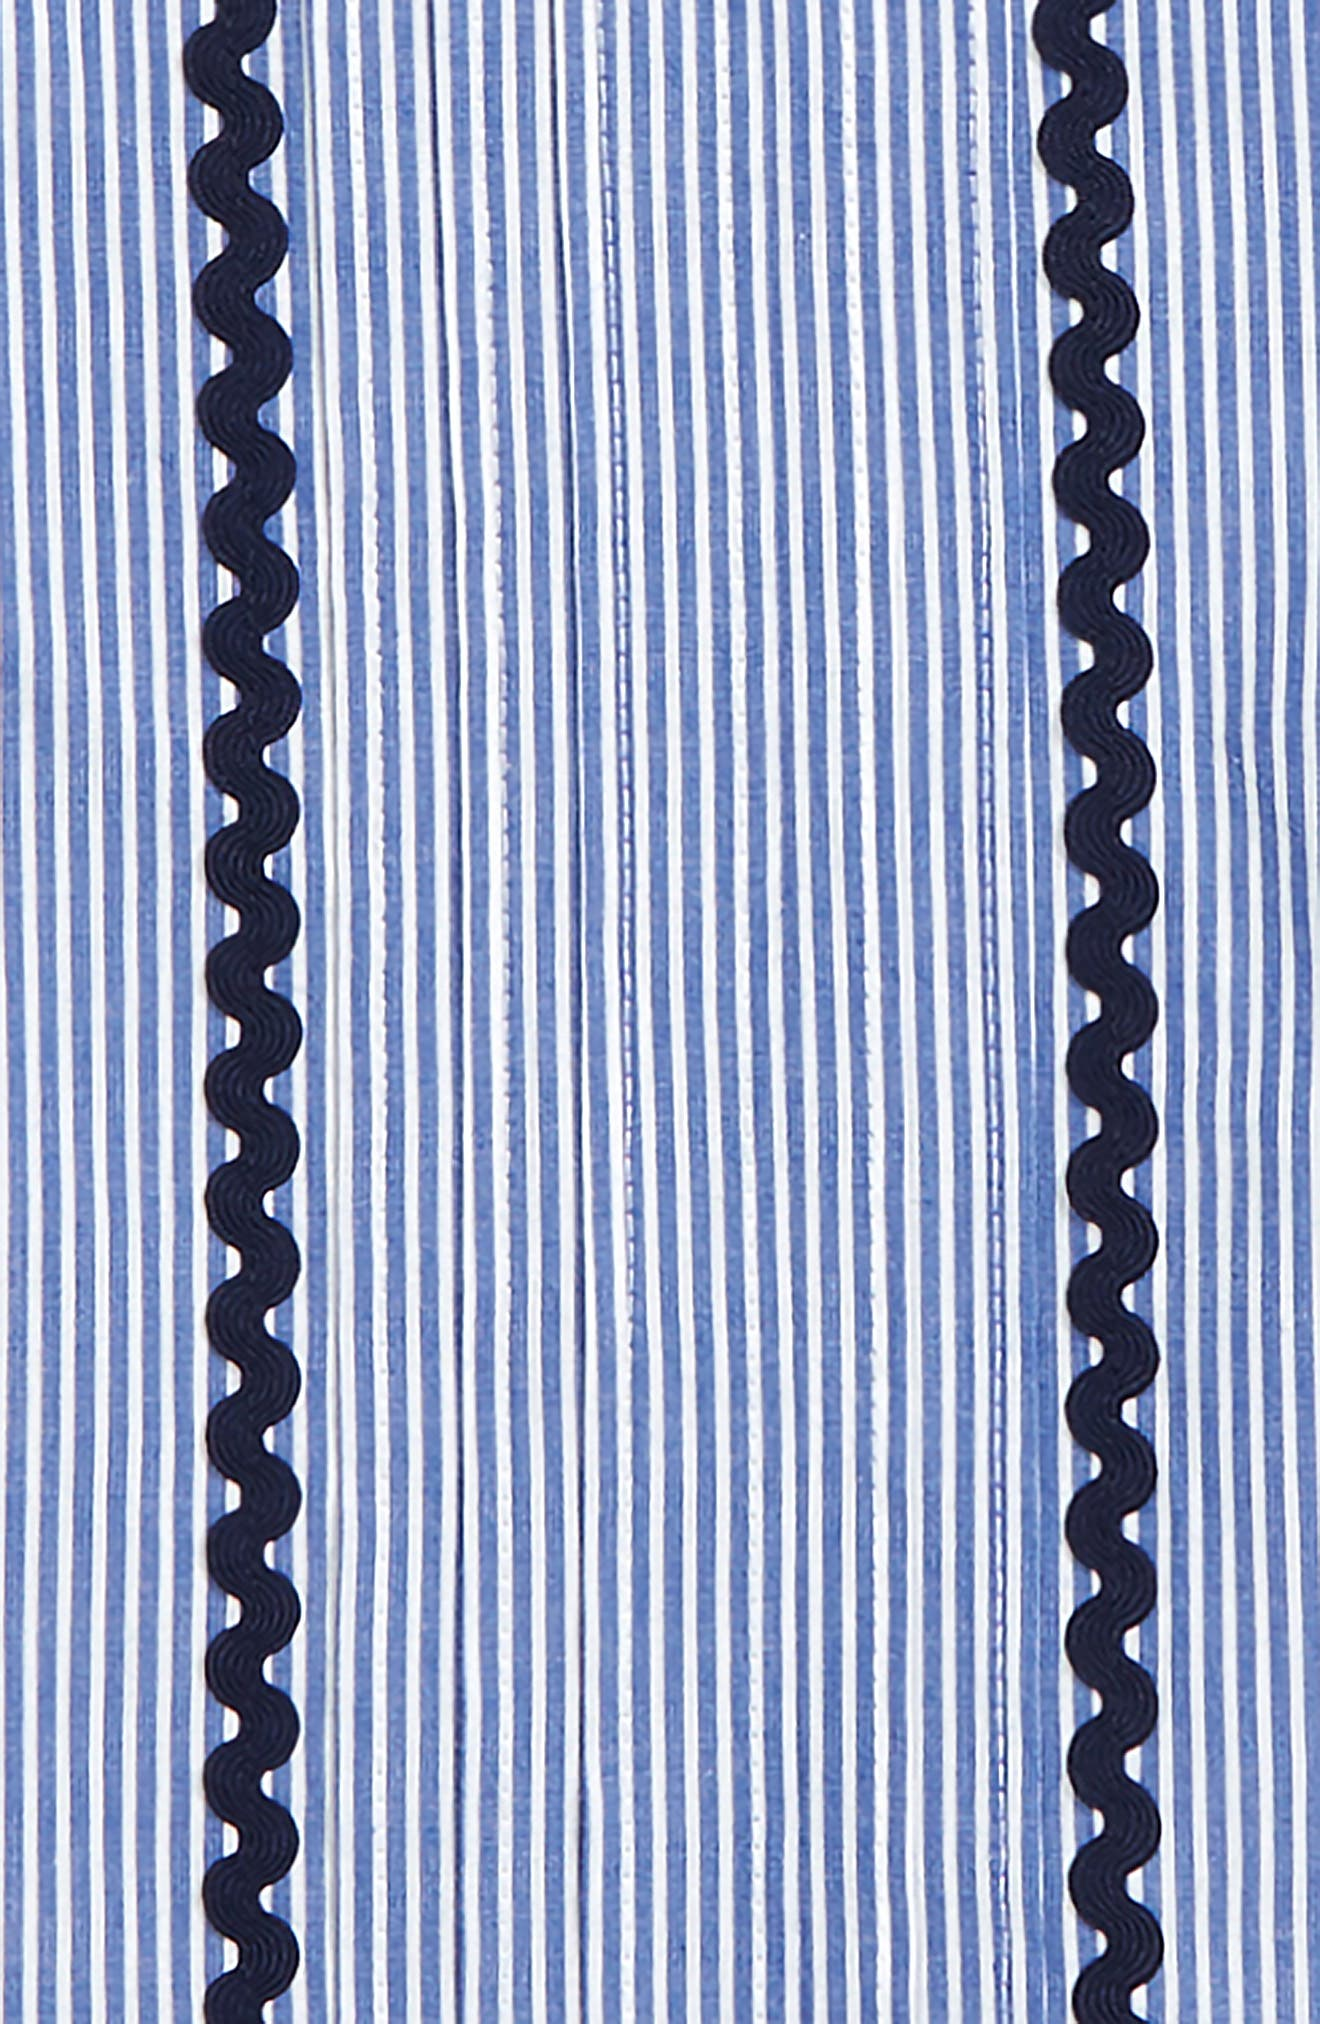 Rickrack Stripe Top,                             Alternate thumbnail 2, color,                             YACHT BLUE